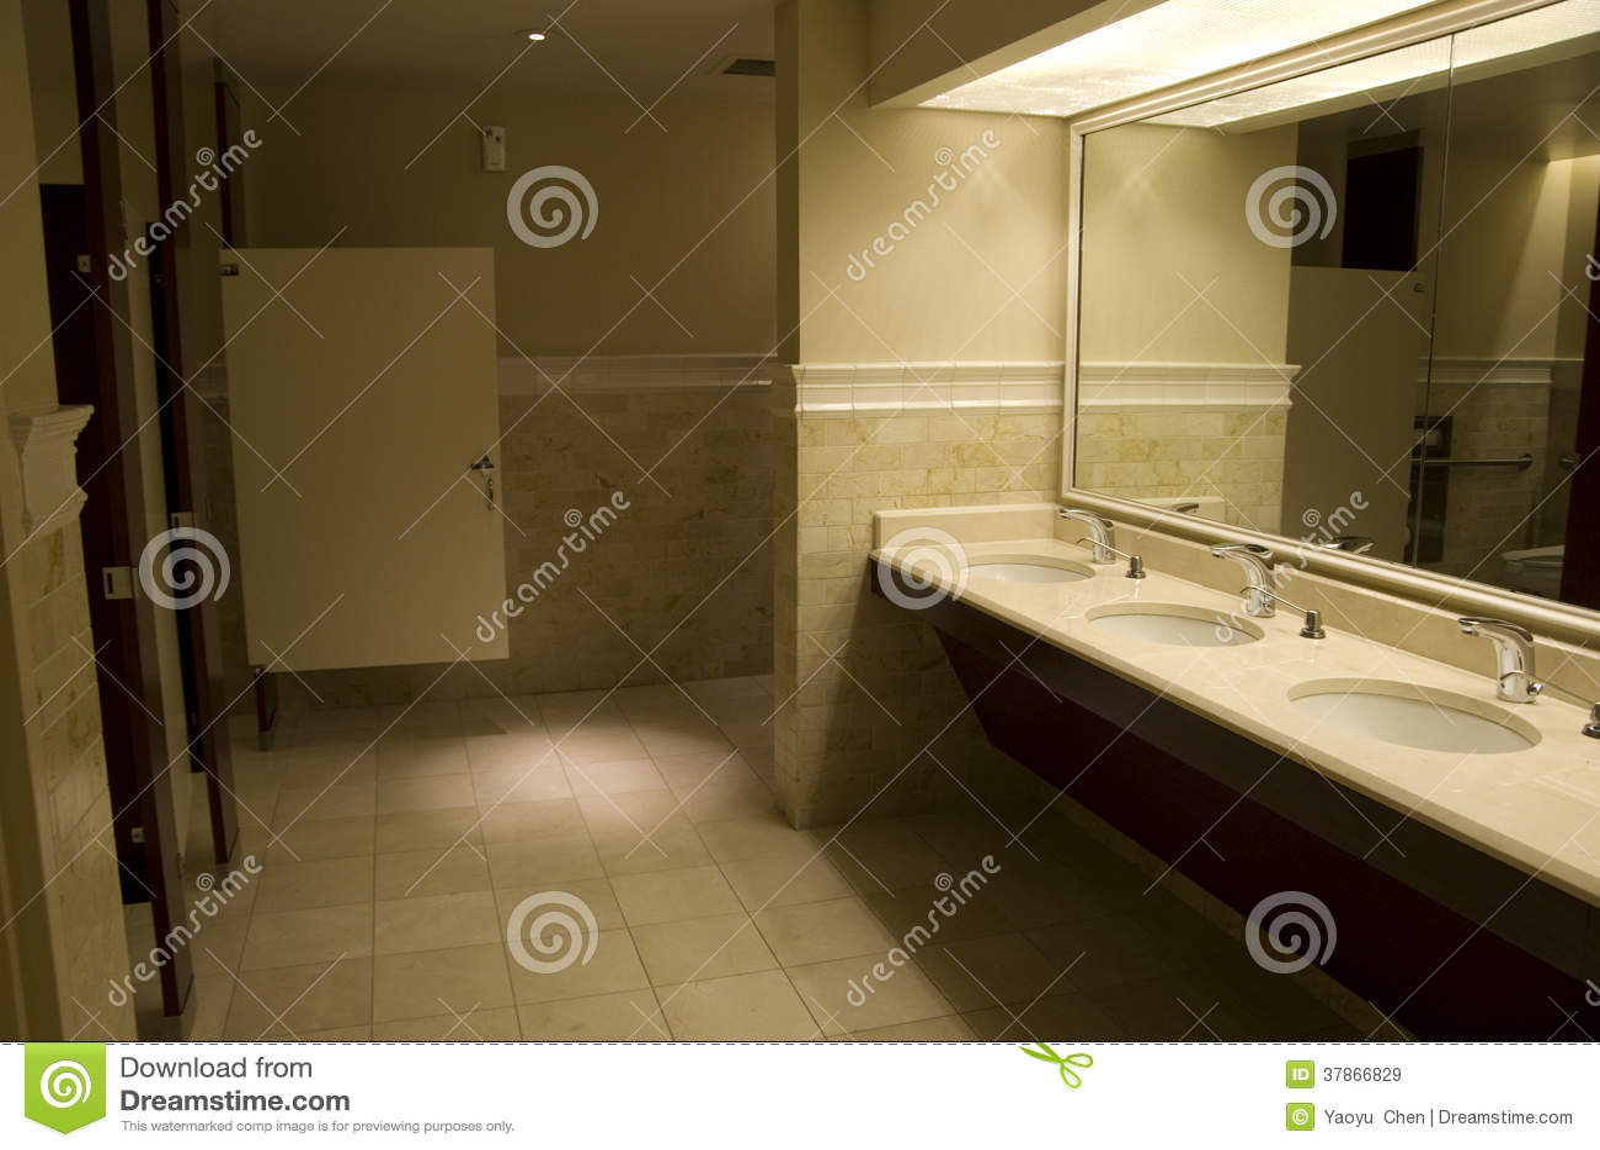 Iluminacion Del Baño:Interiores e iluminación de un cuarto de baño público